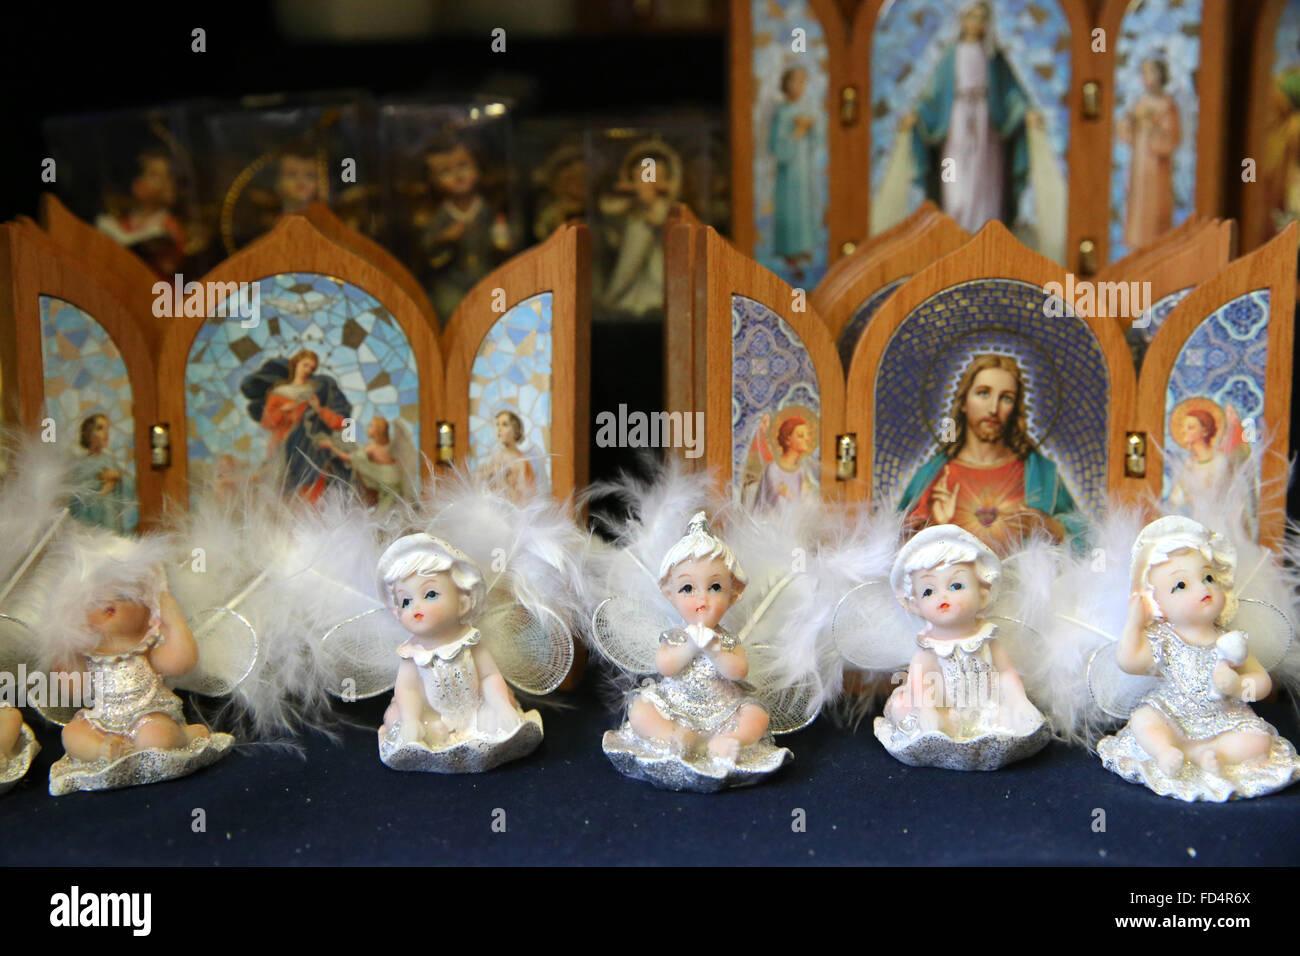 Catholic Faith Store. Religious articles. Angels. - Stock Image